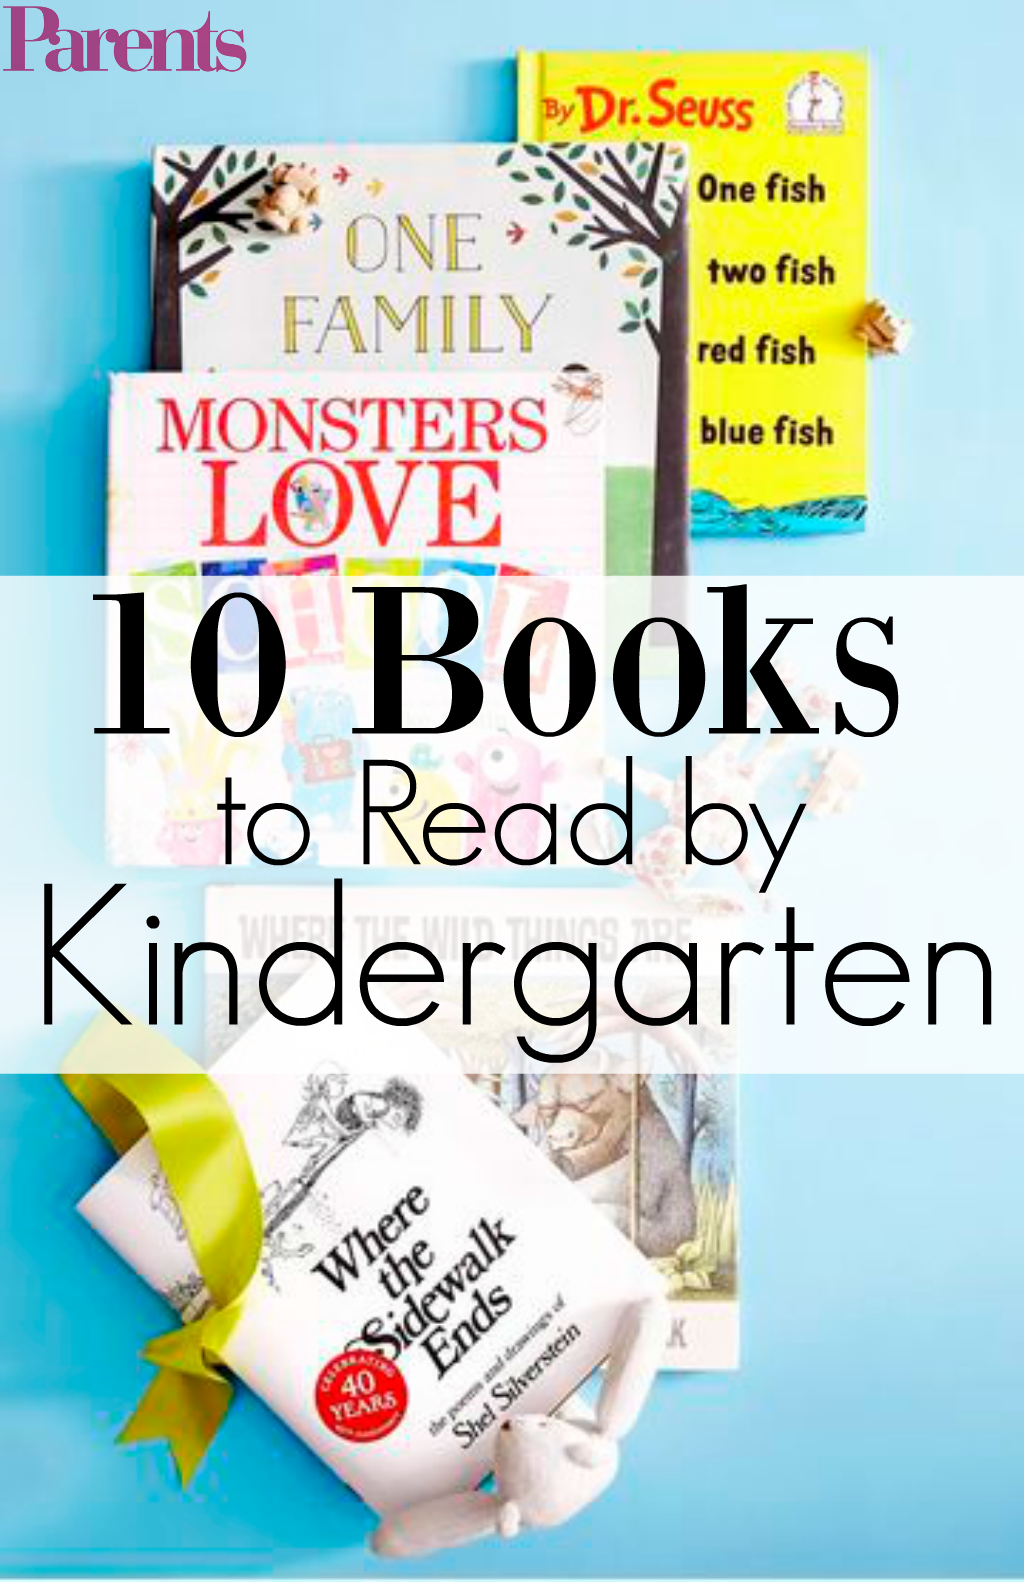 bf7d8d8e236e4b2767593023e4395412 - Kindergarten Books To Read